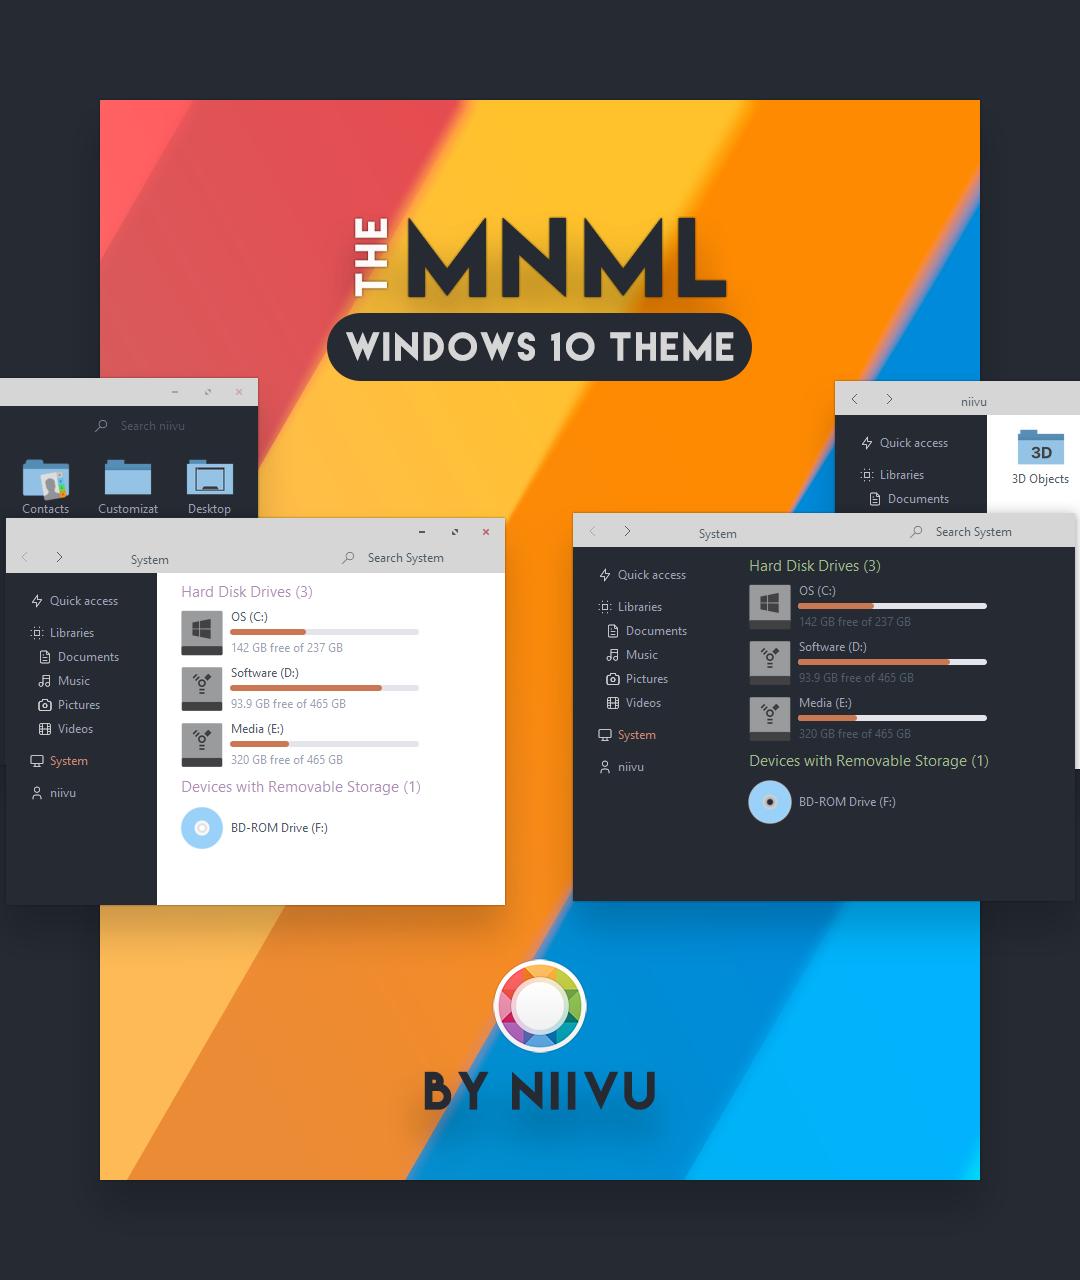 The MNML for Windows 10